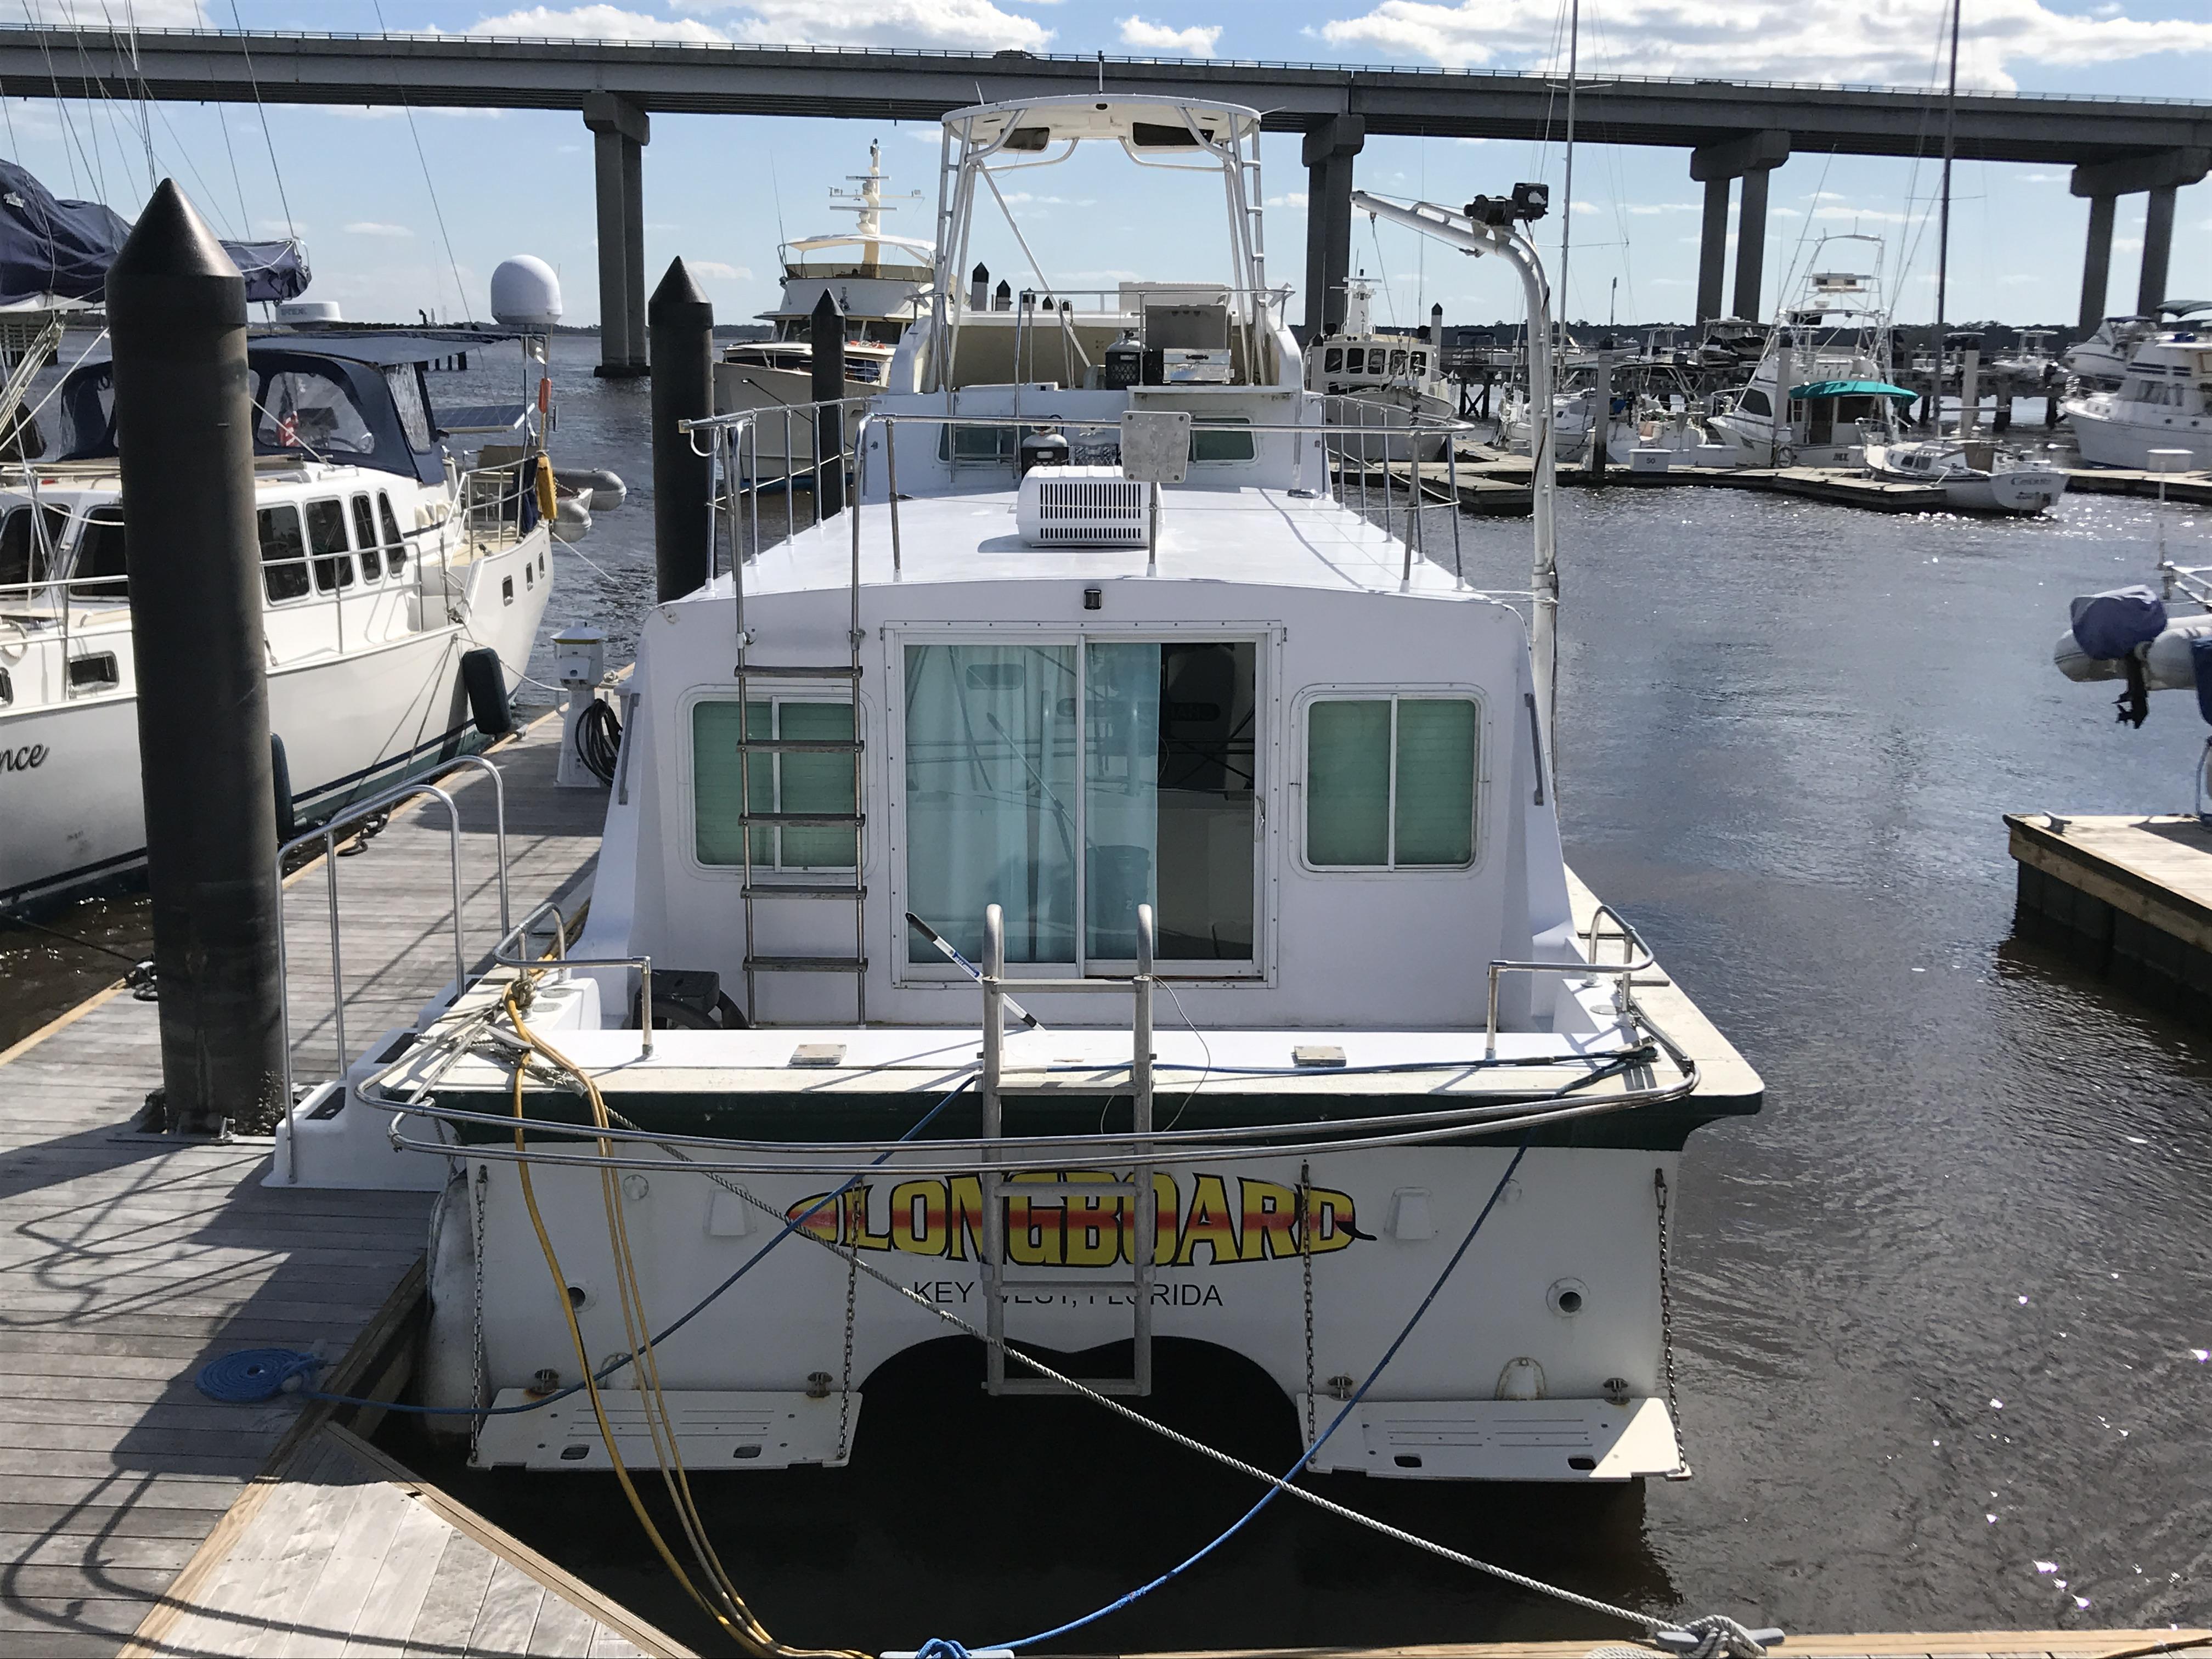 Carri-craft 57-ft Power Catamaran - Carri-craft stern